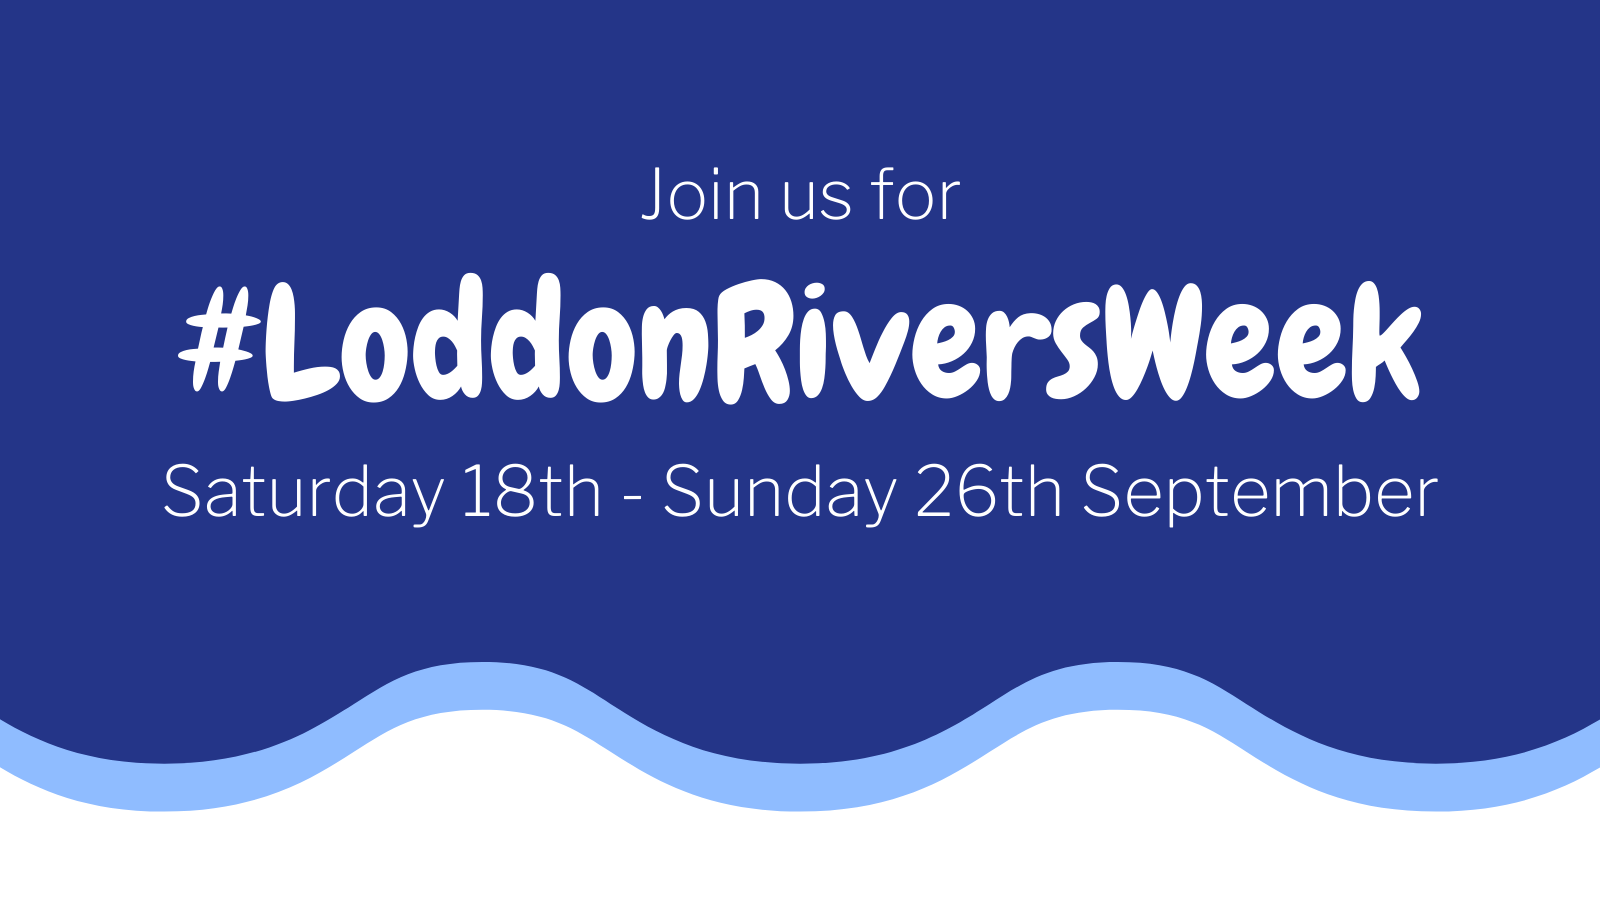 Banner for Loddon Rivers Week